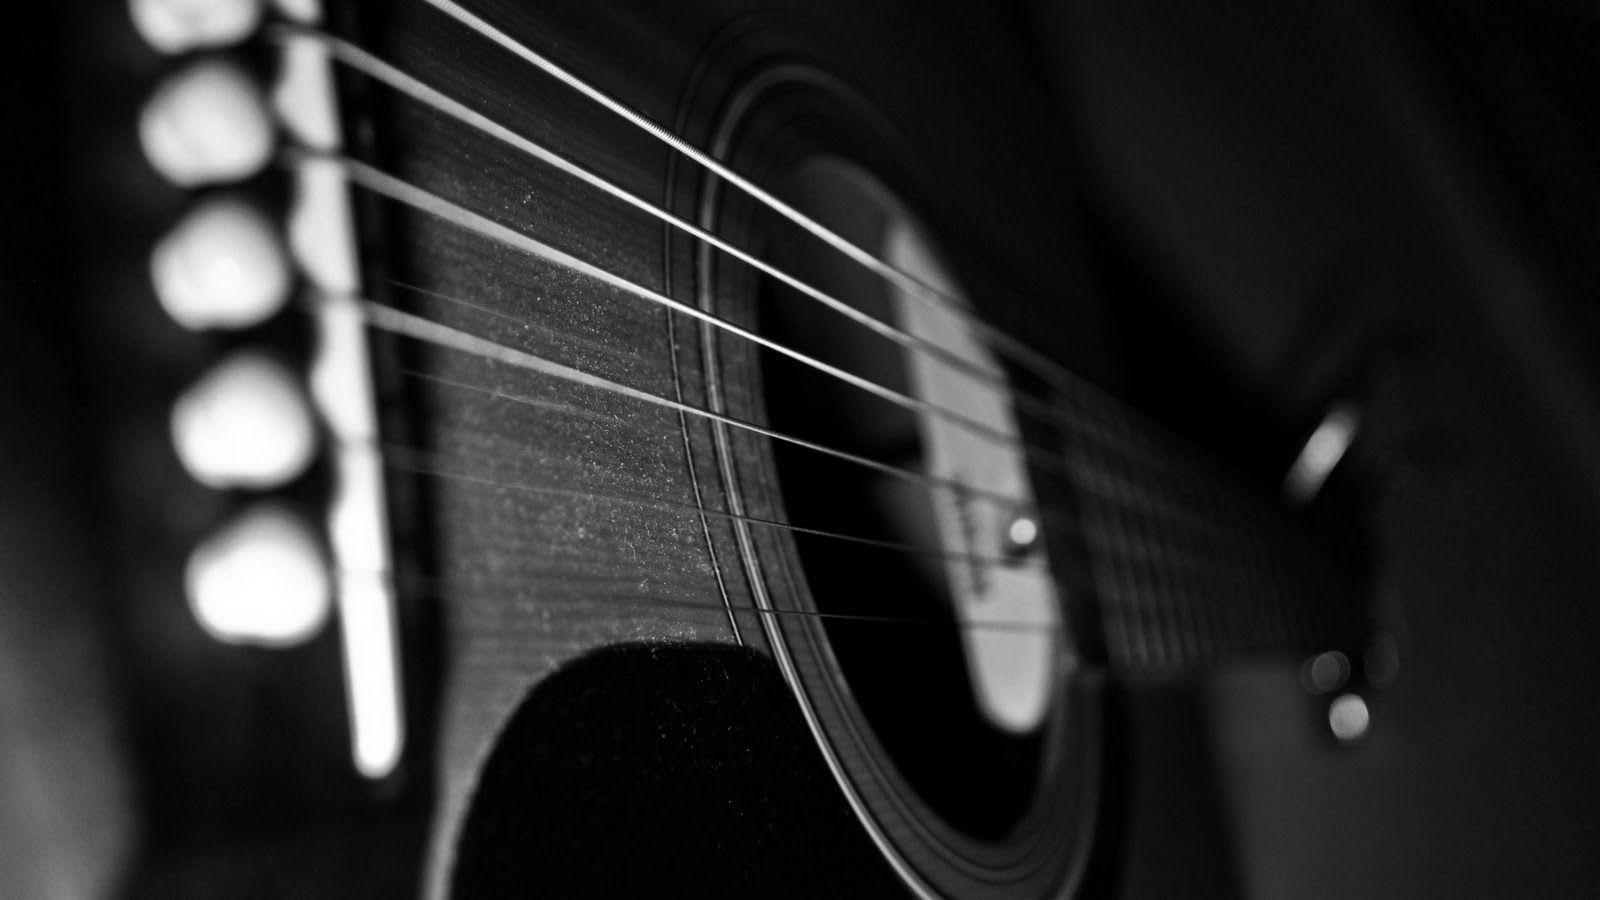 Acoustic Black guitar wallpaper pictures images